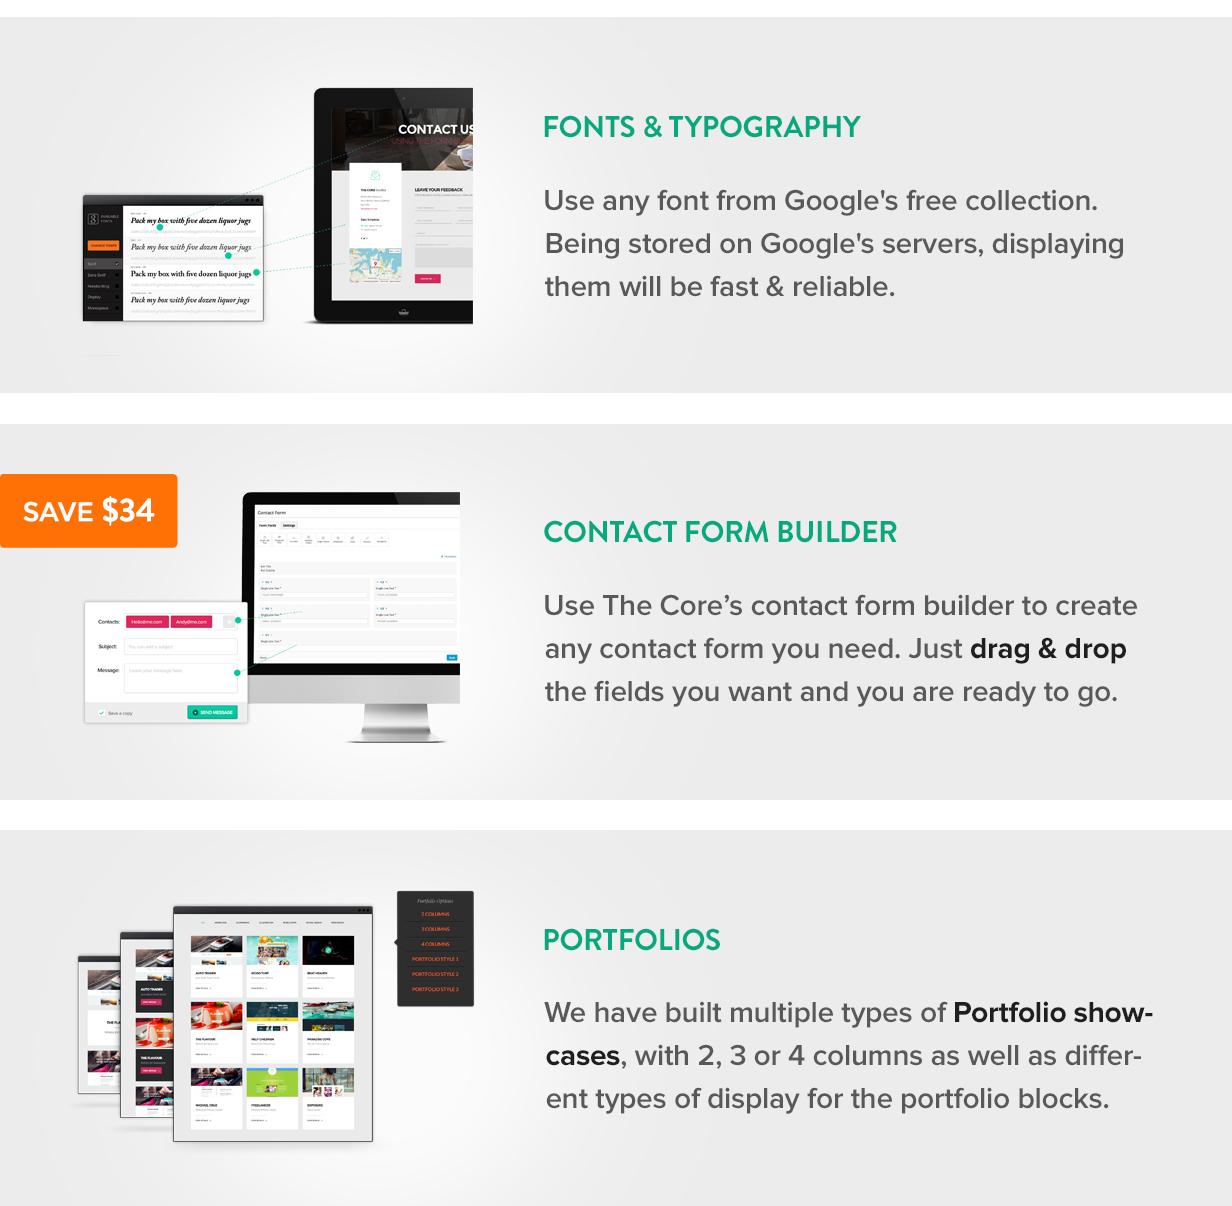 features5.jpg